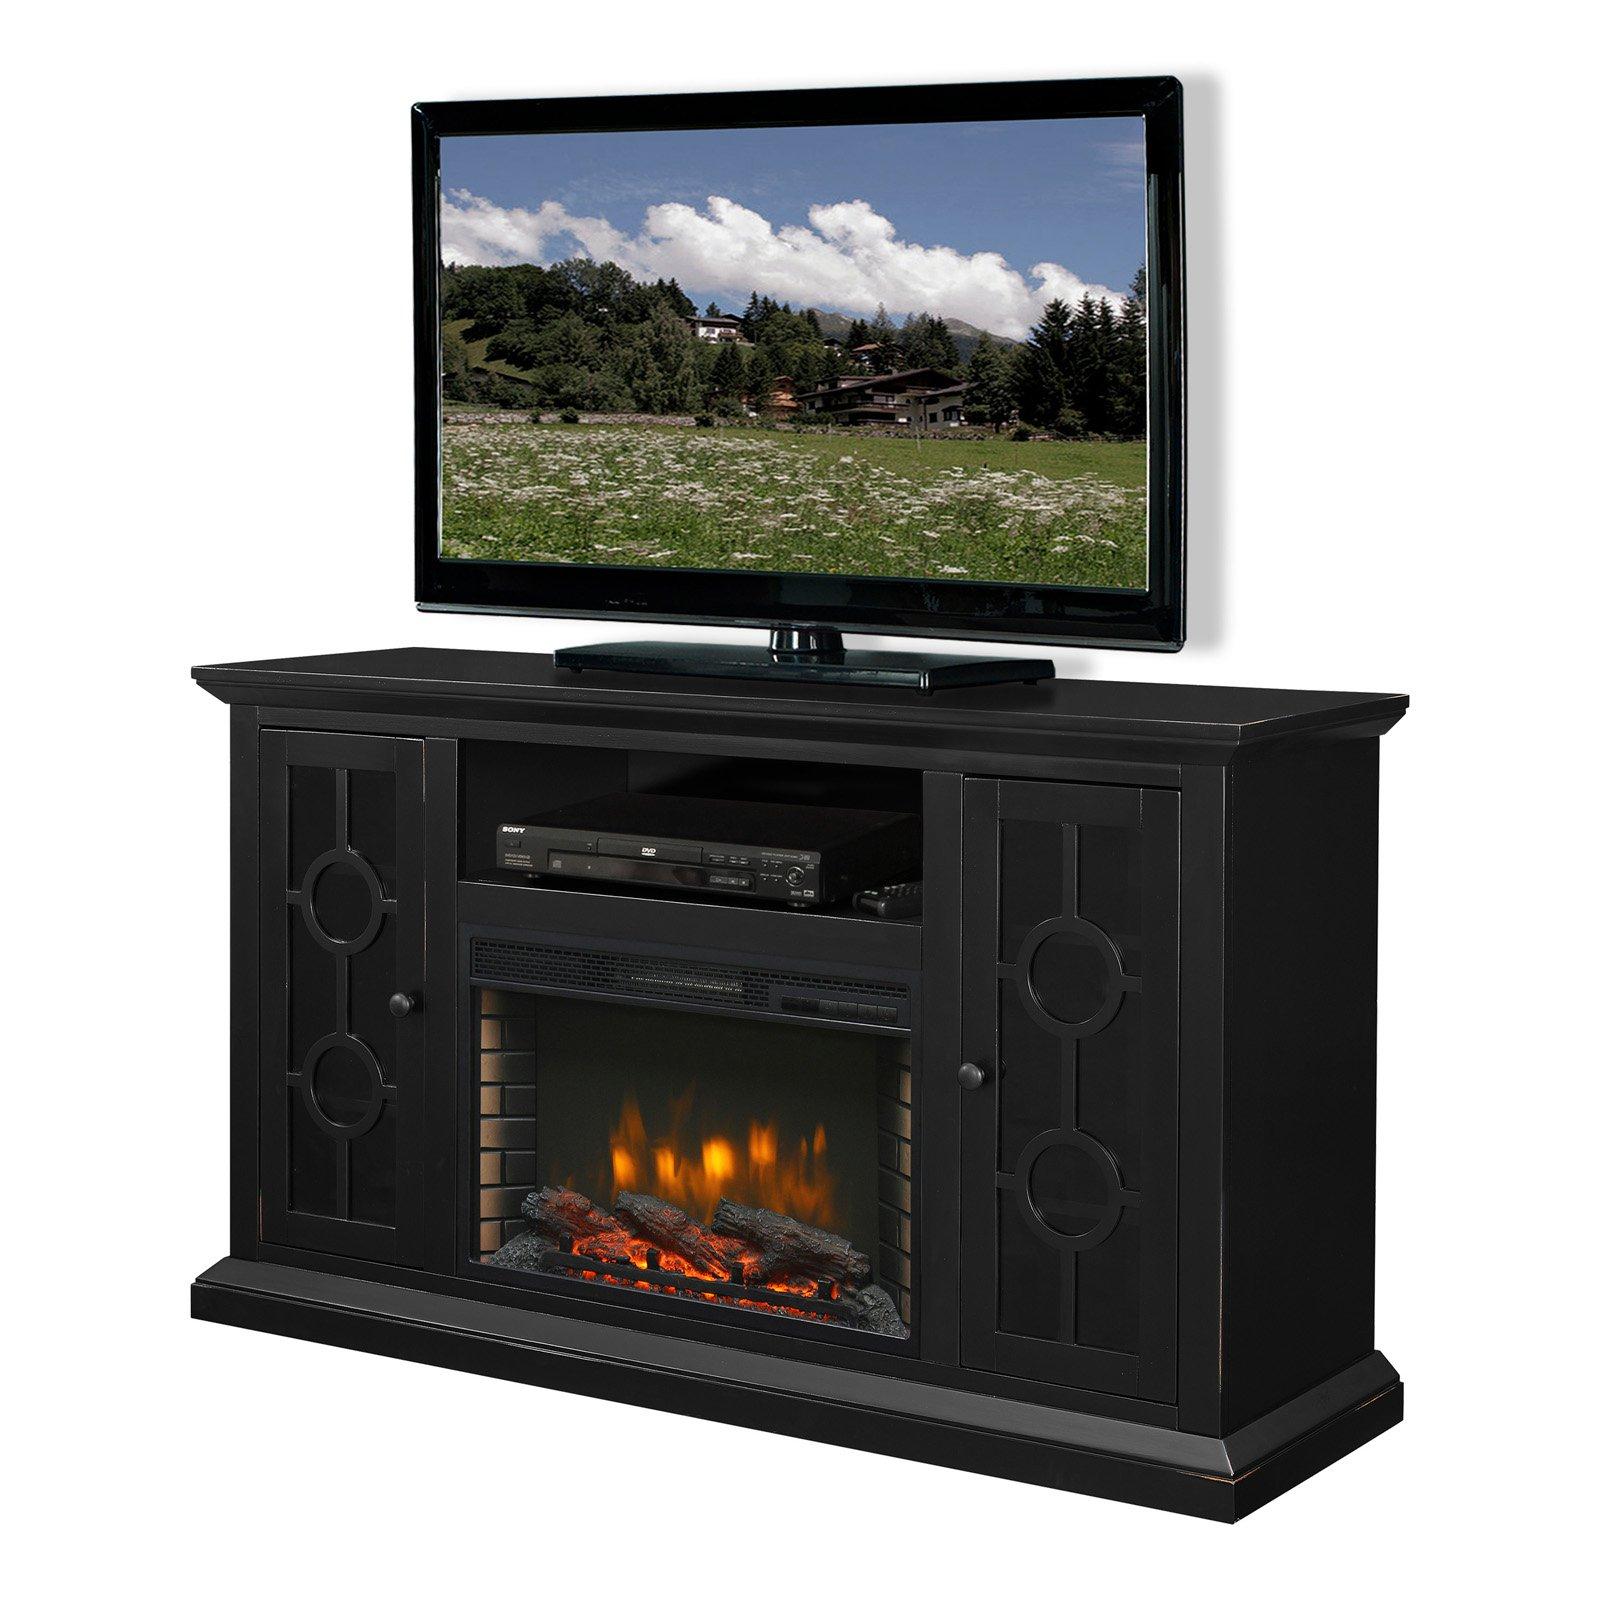 "Muskoka Ashby 58"" Media Electric Fireplace Aged Black"